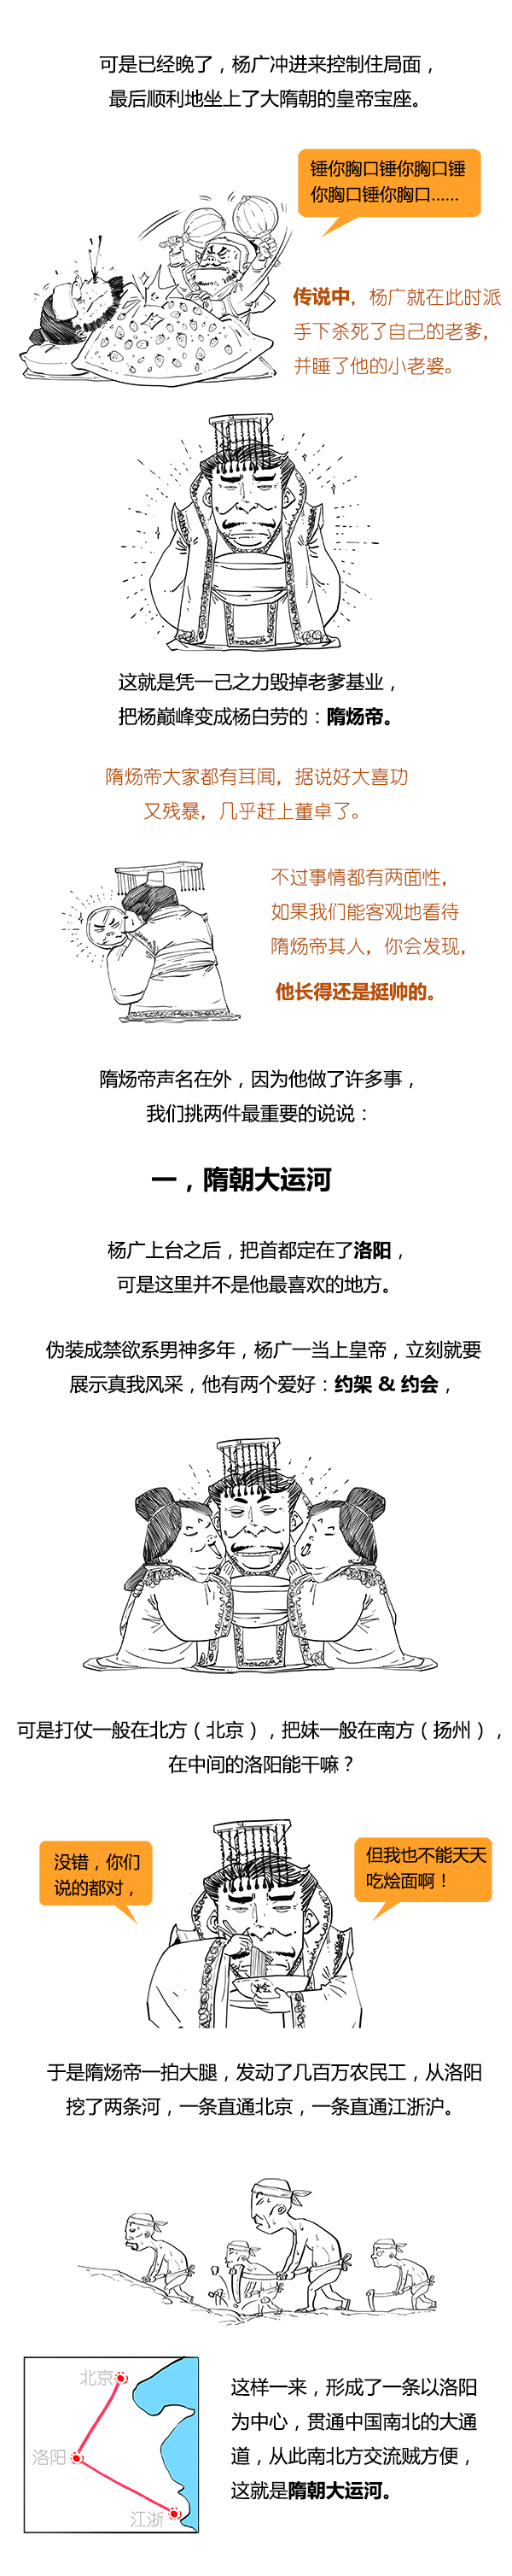 Stone历史剧-隋_04.png